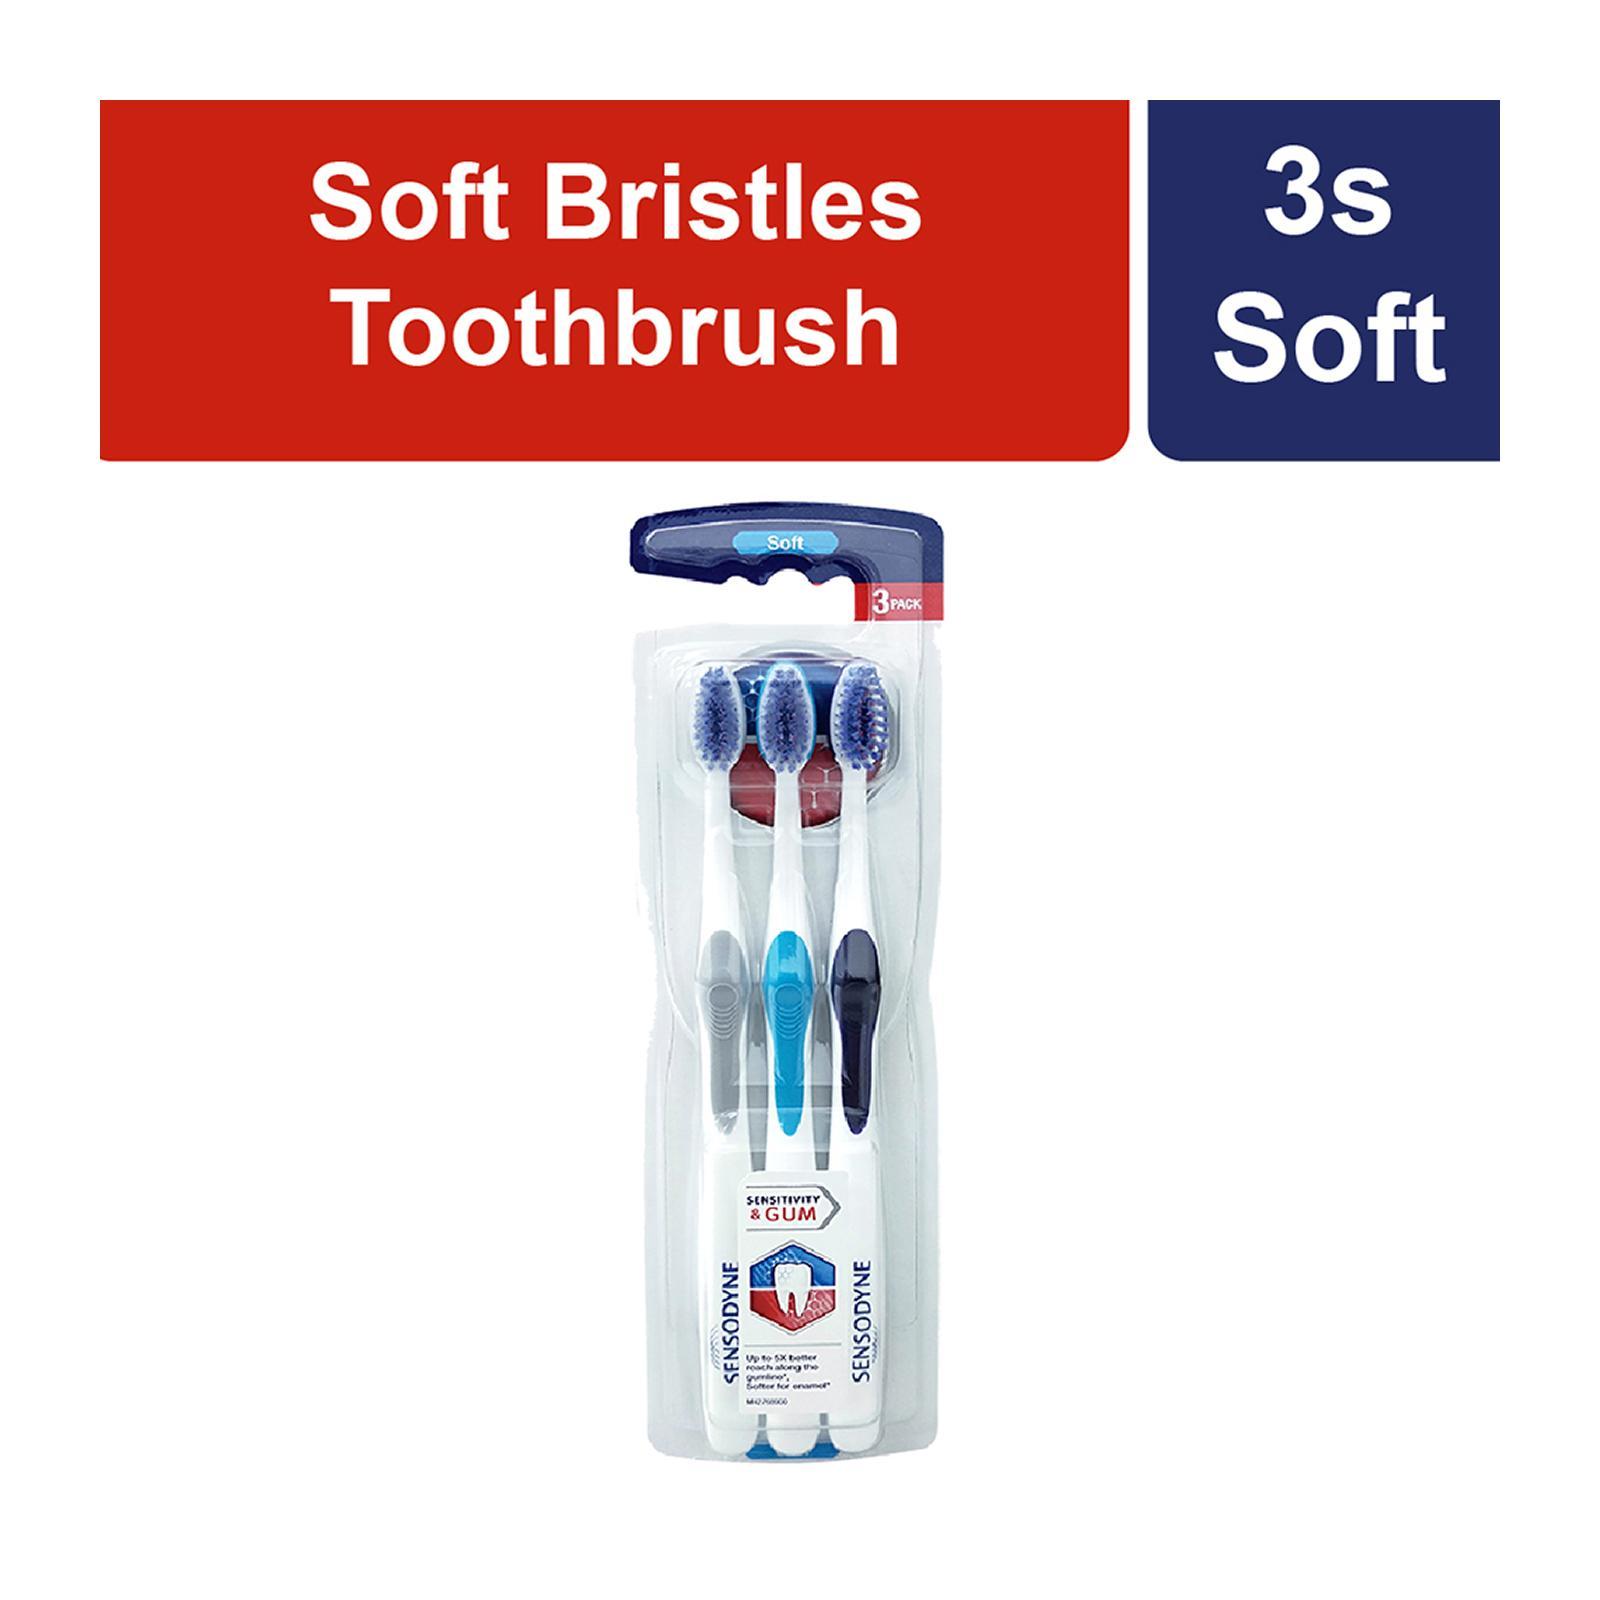 Sensodyne Sensitivity and Gum Soft 3s Toothbrush